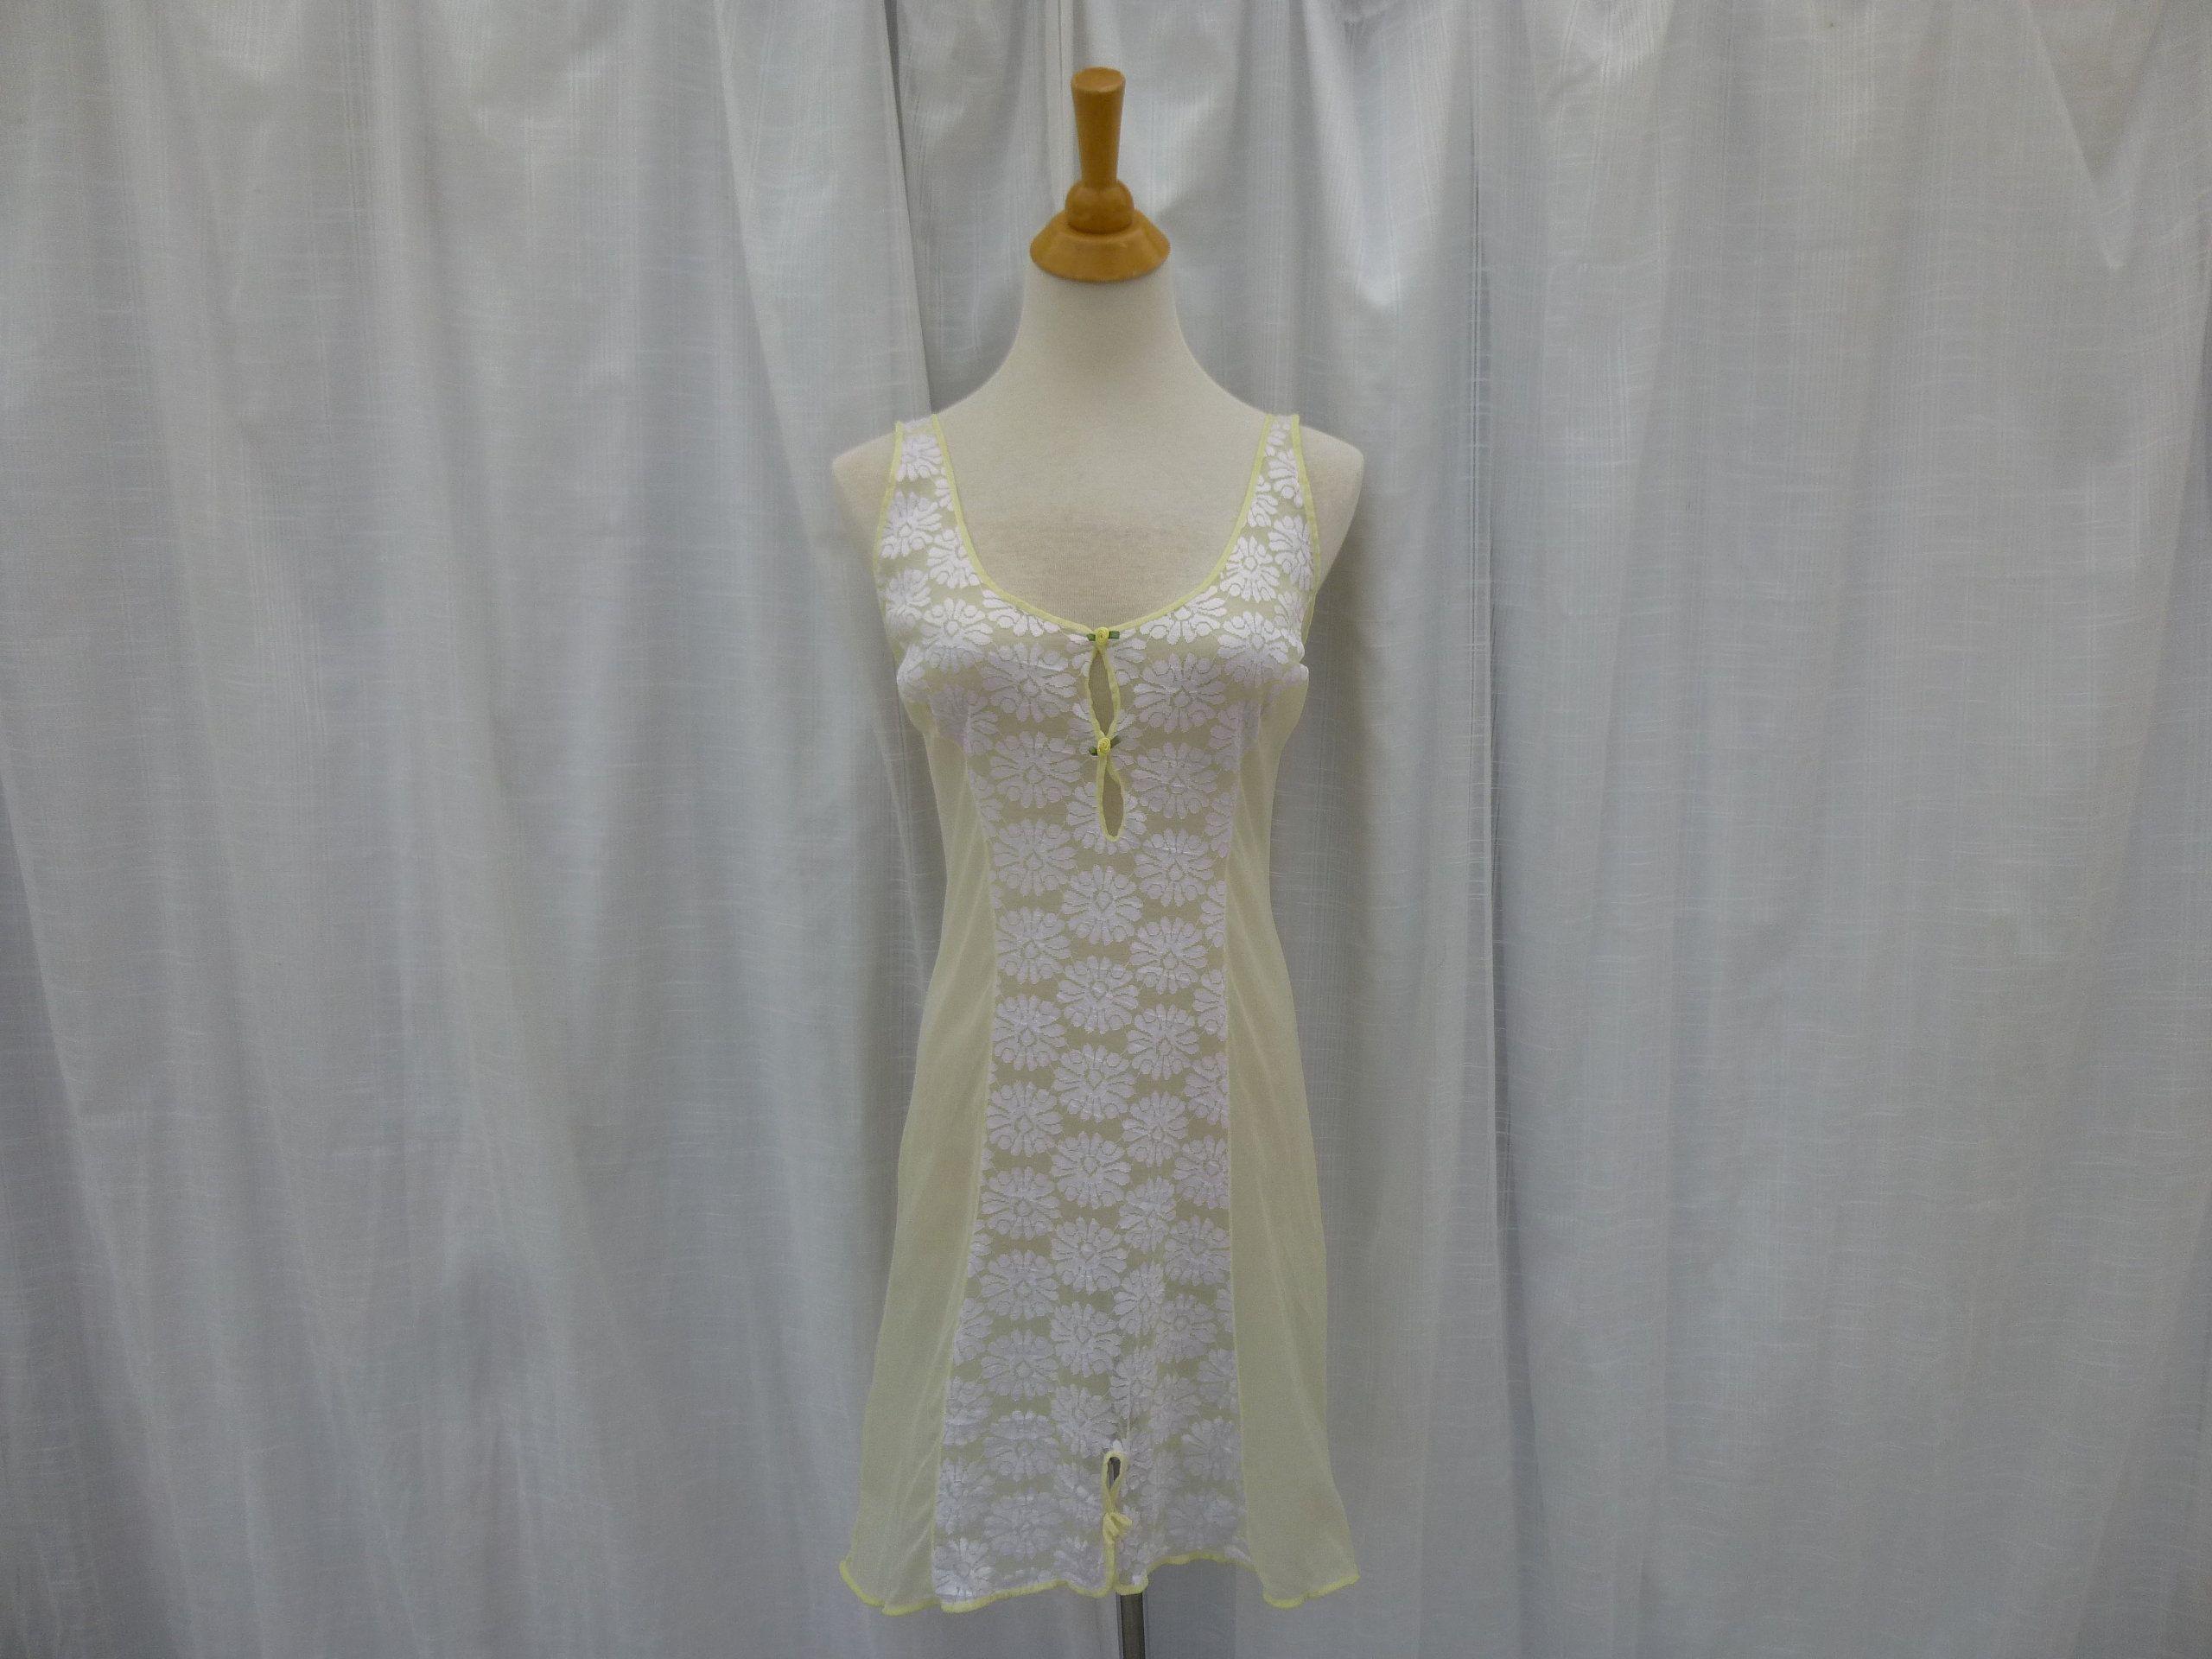 70s Vanity Fair FULL SLIP Size 40 or a L Large Antique White